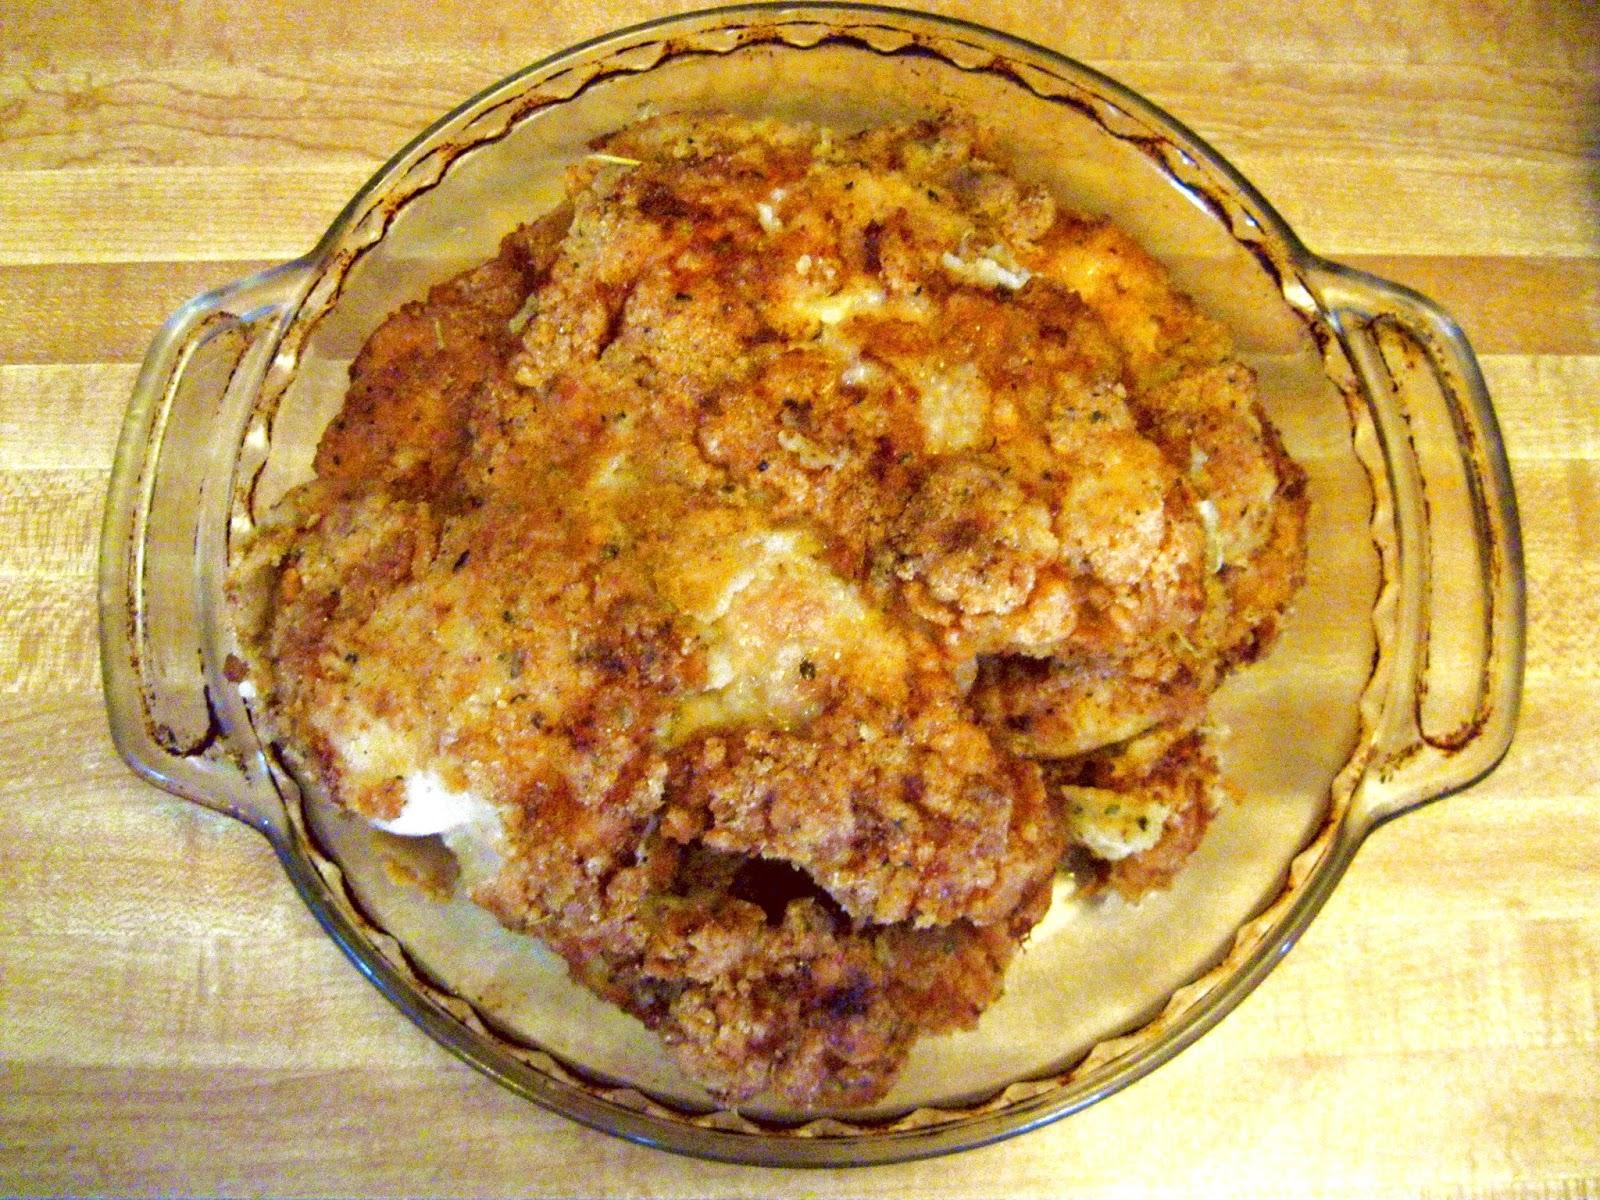 photo by sookietex of sookietex' Gluten-Free Fried Boneless Skinless Chicken Thigh Recipe